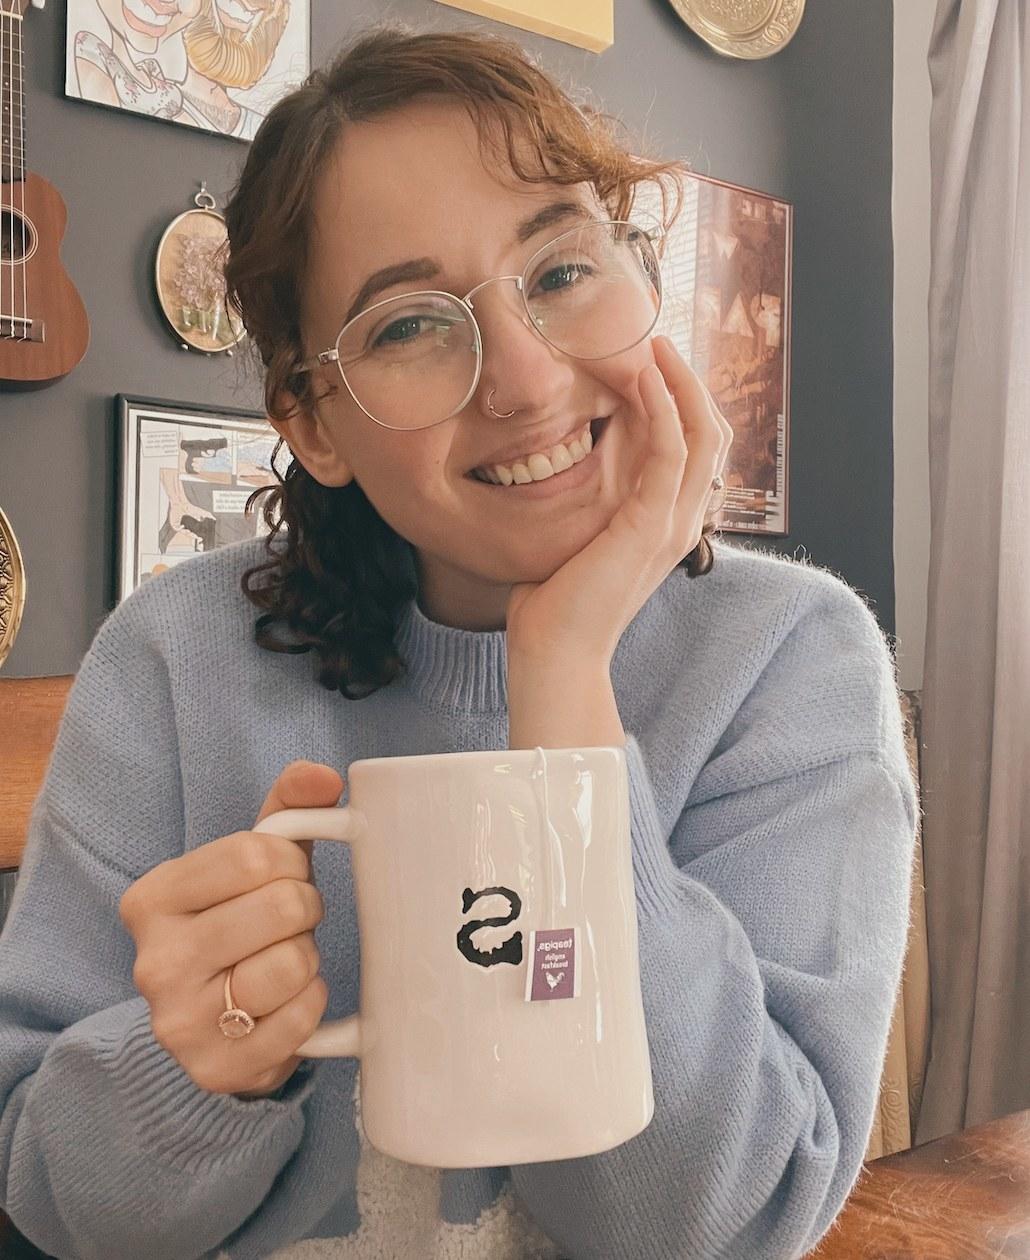 A person holding a mug of hot tea